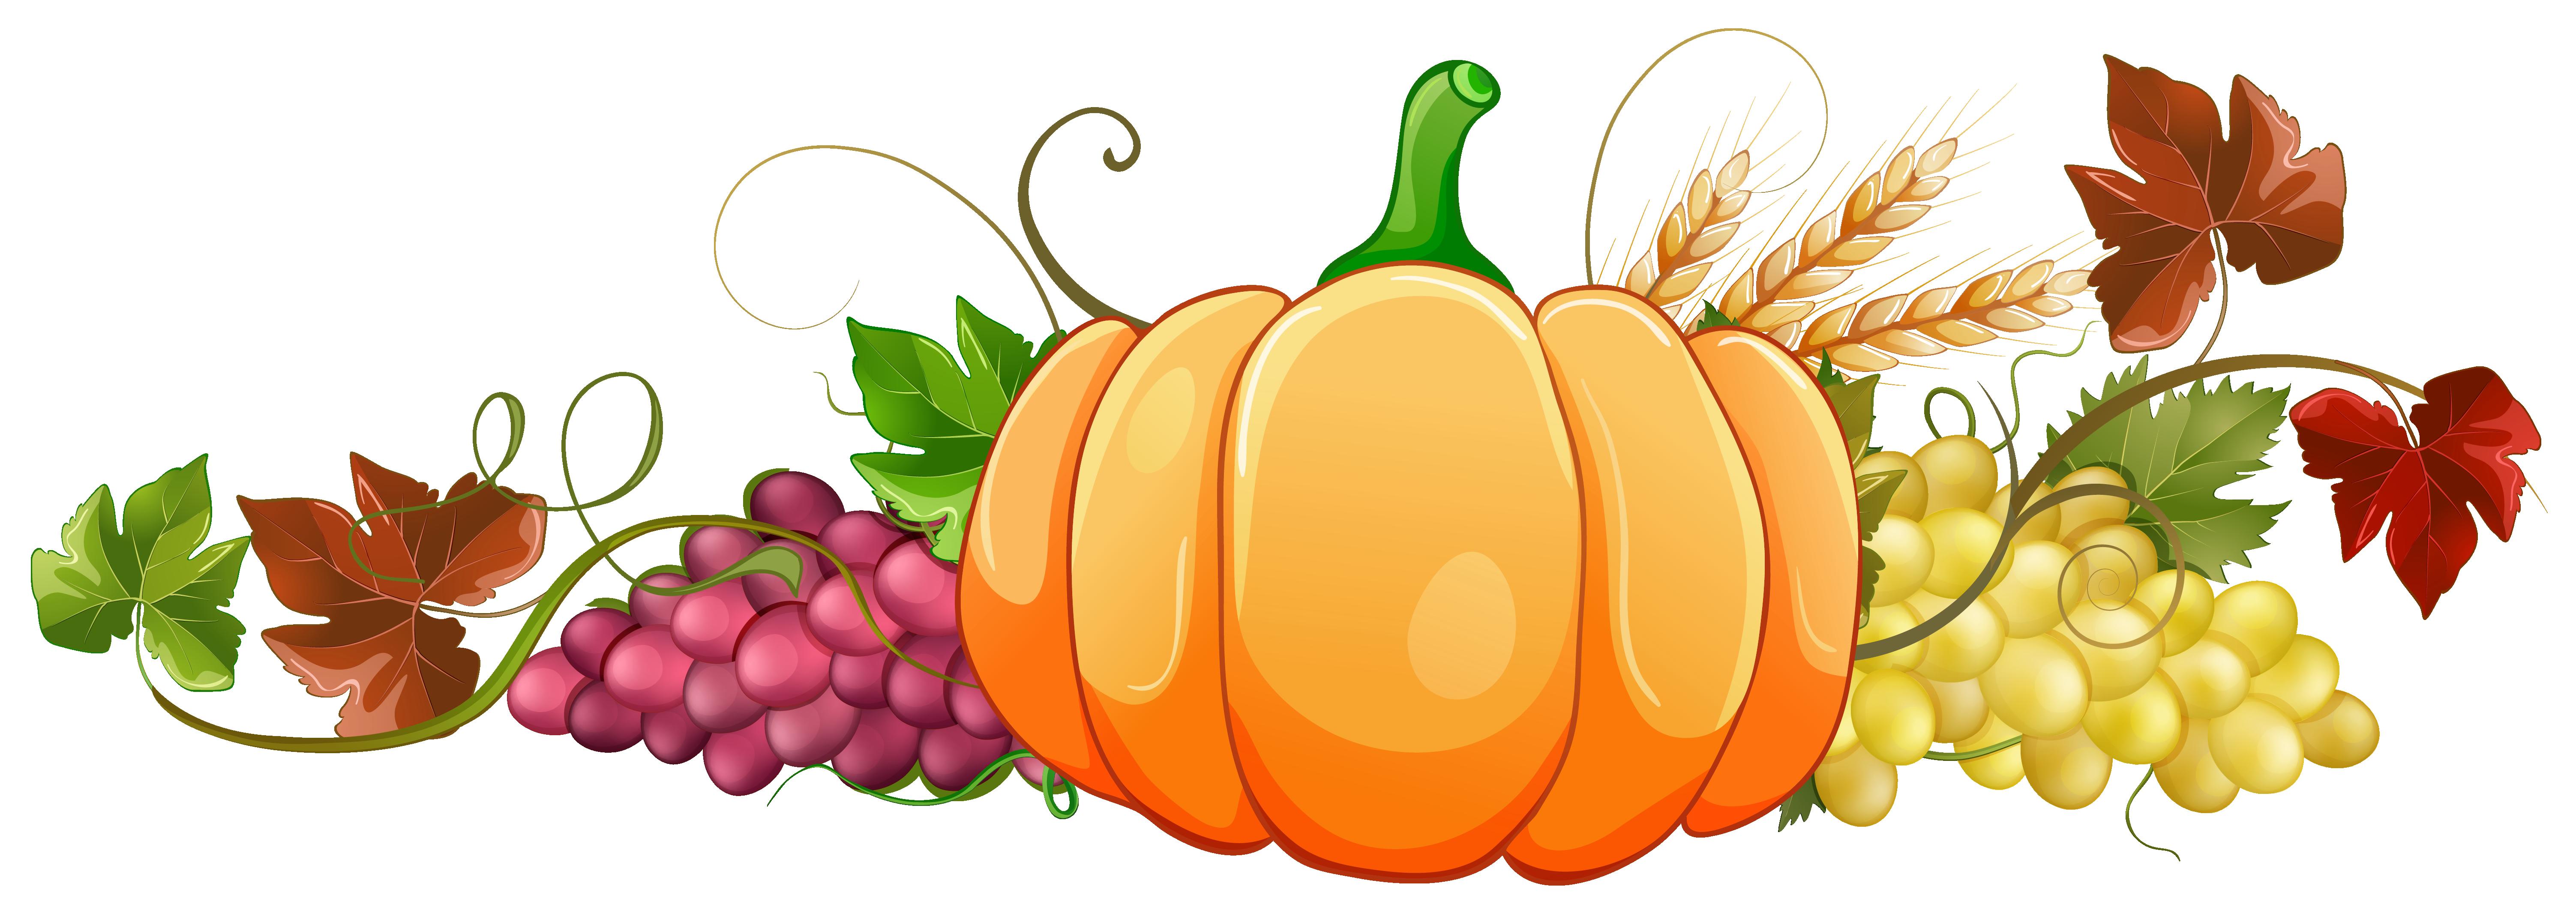 Fall Pumpkin Clipart at GetDrawings | Free download